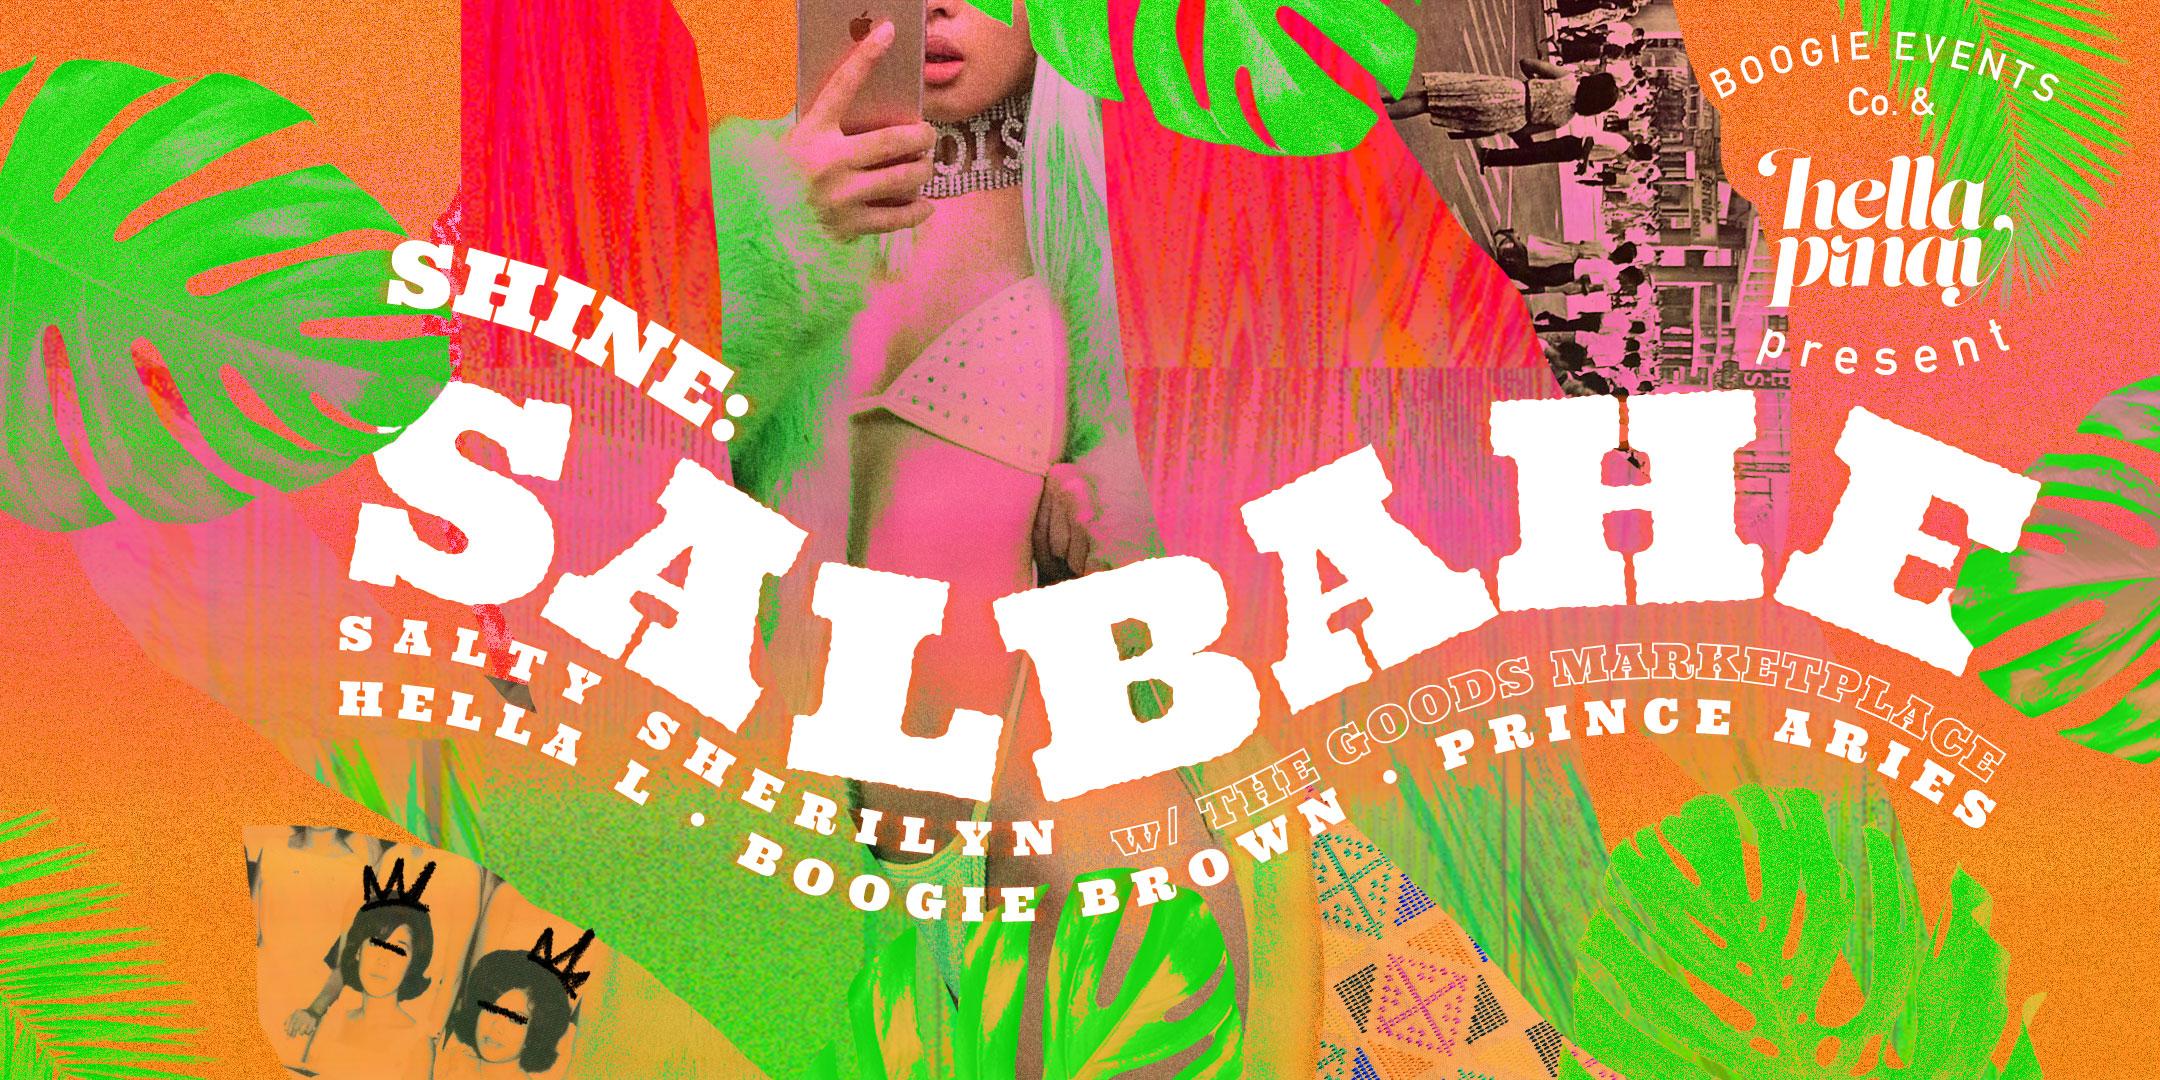 Salbahe_1901_Eventbrite.jpg